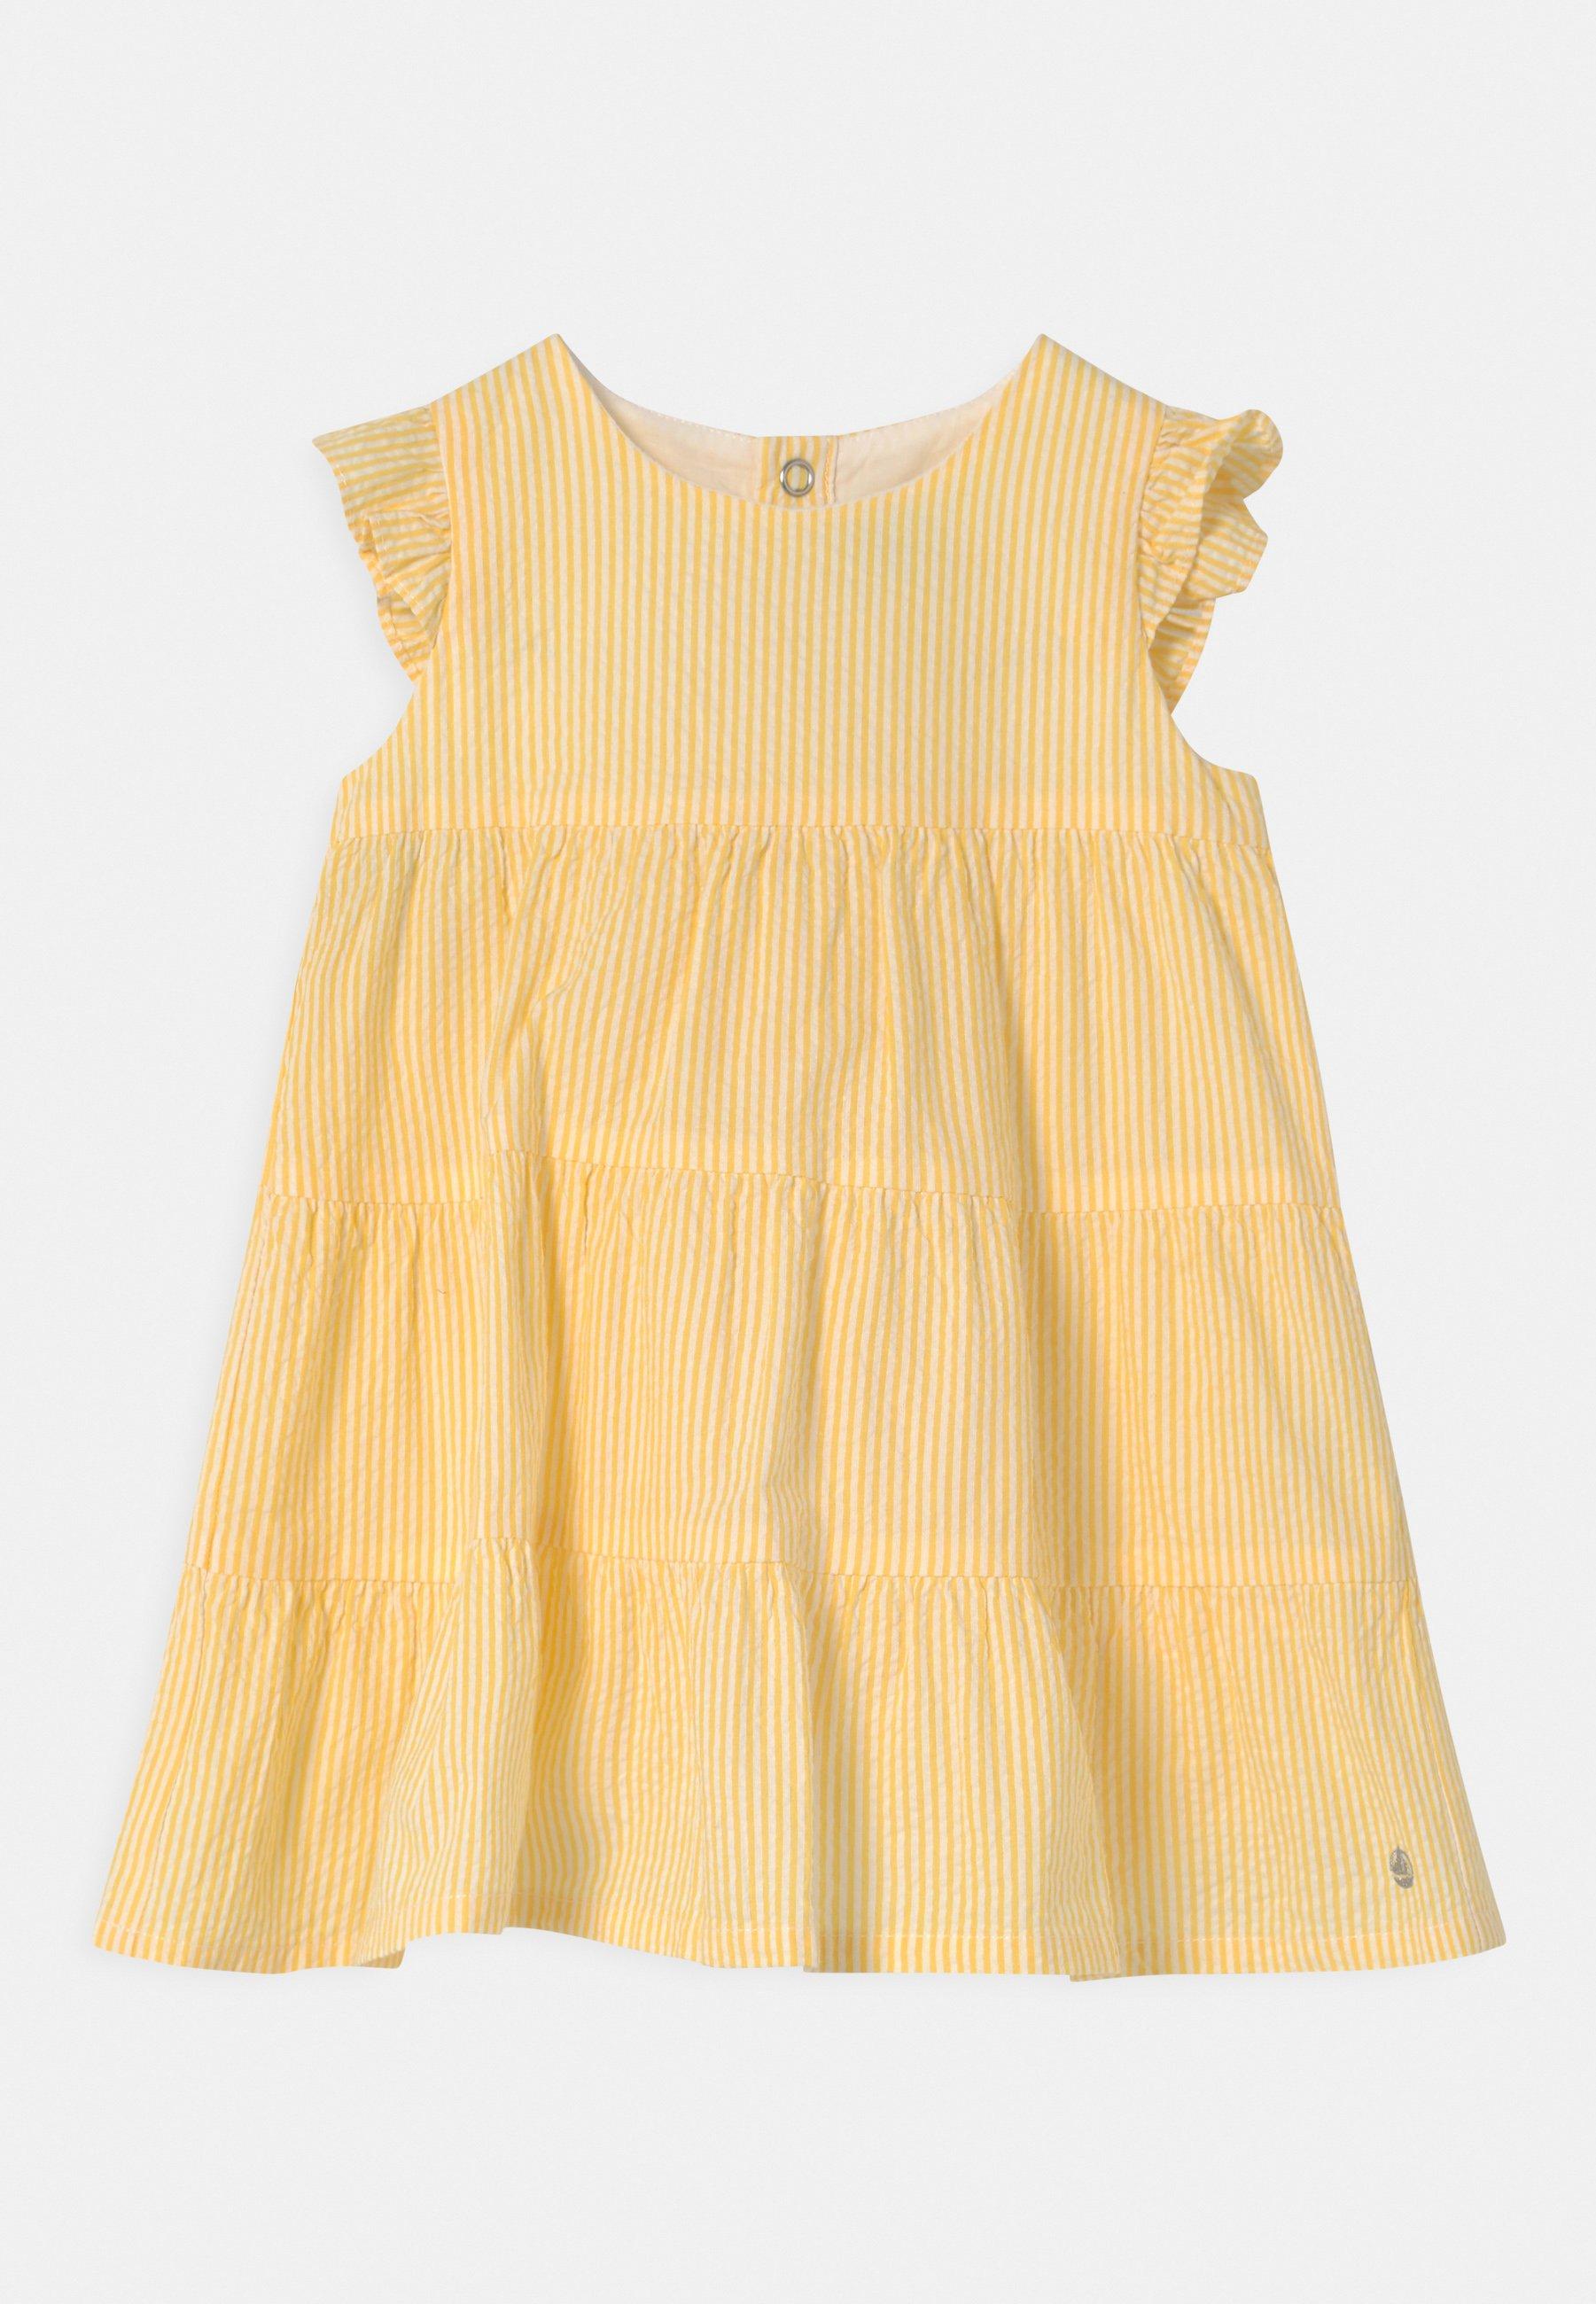 Kids Day dress